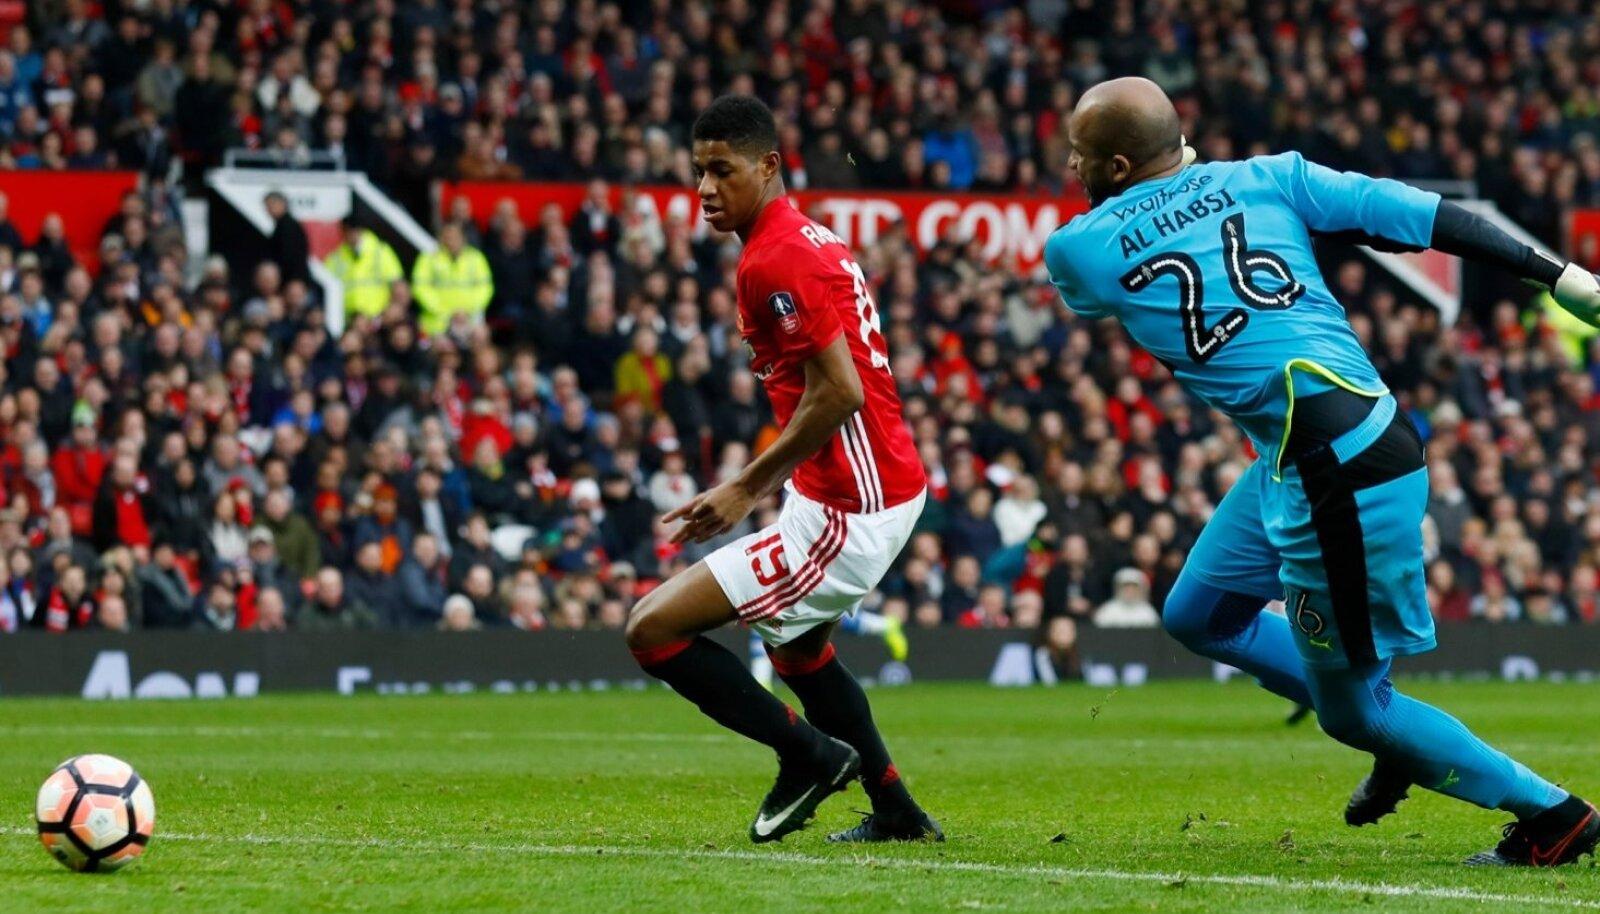 Manchester United's Marcus Rashford scores their fourth goal past Reading's Ali Al Habsi